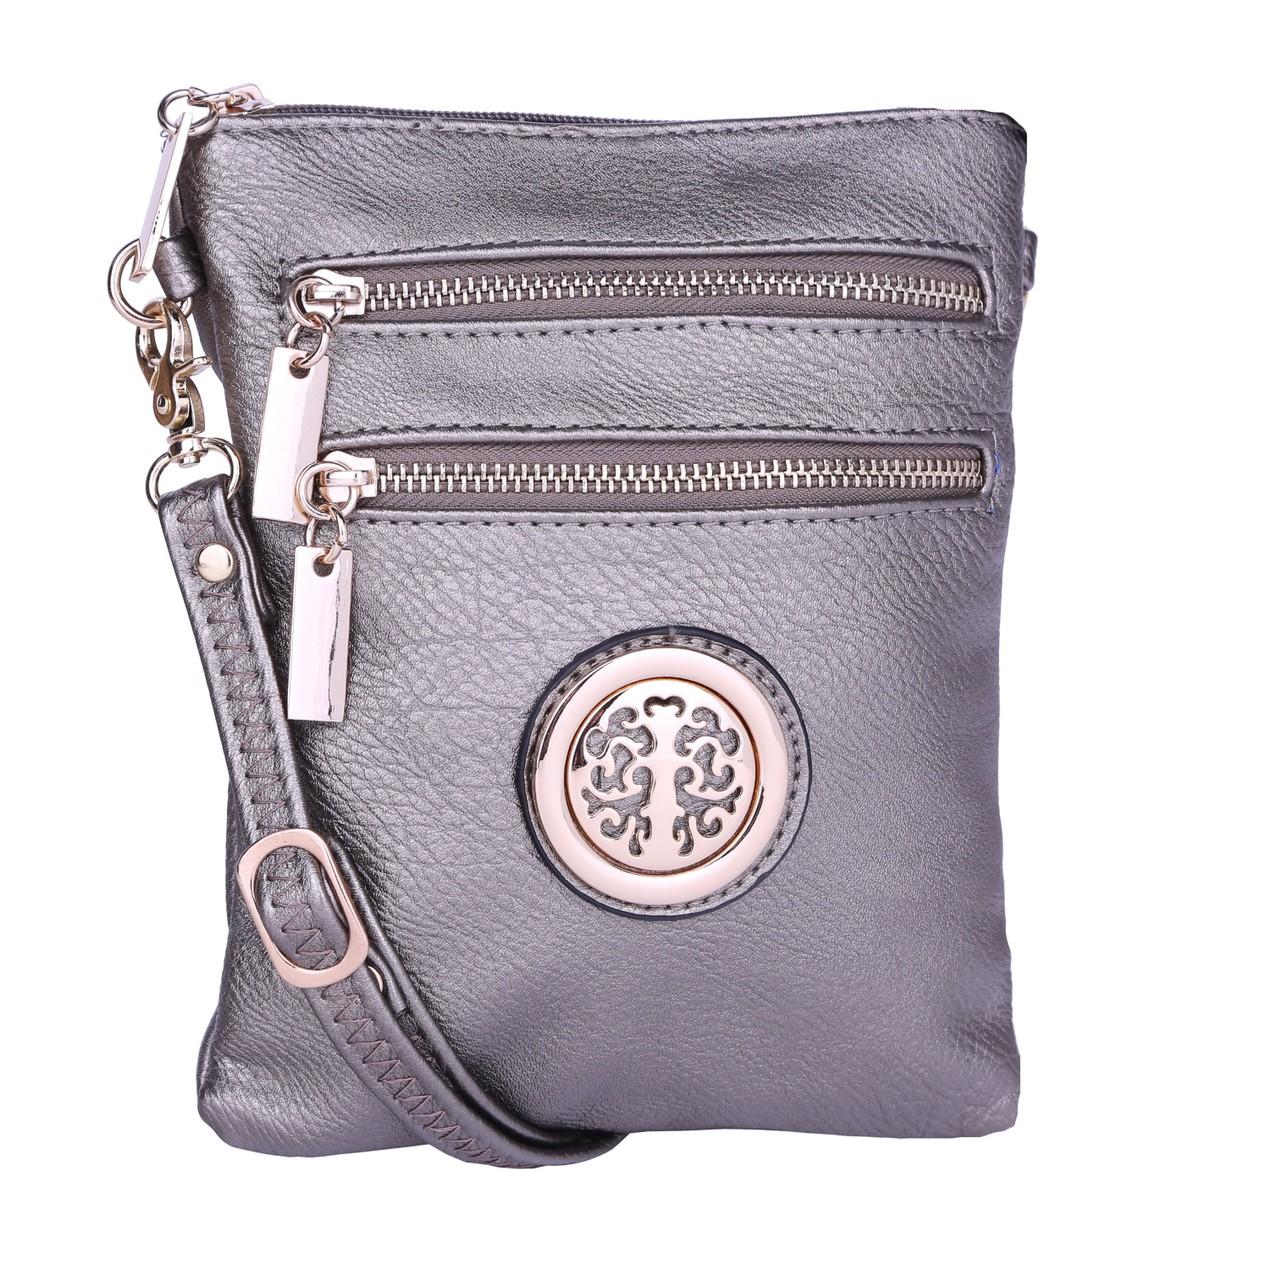 53ecf83d79 MKF Collection Arabelle Crossbody Handbag - Tanga